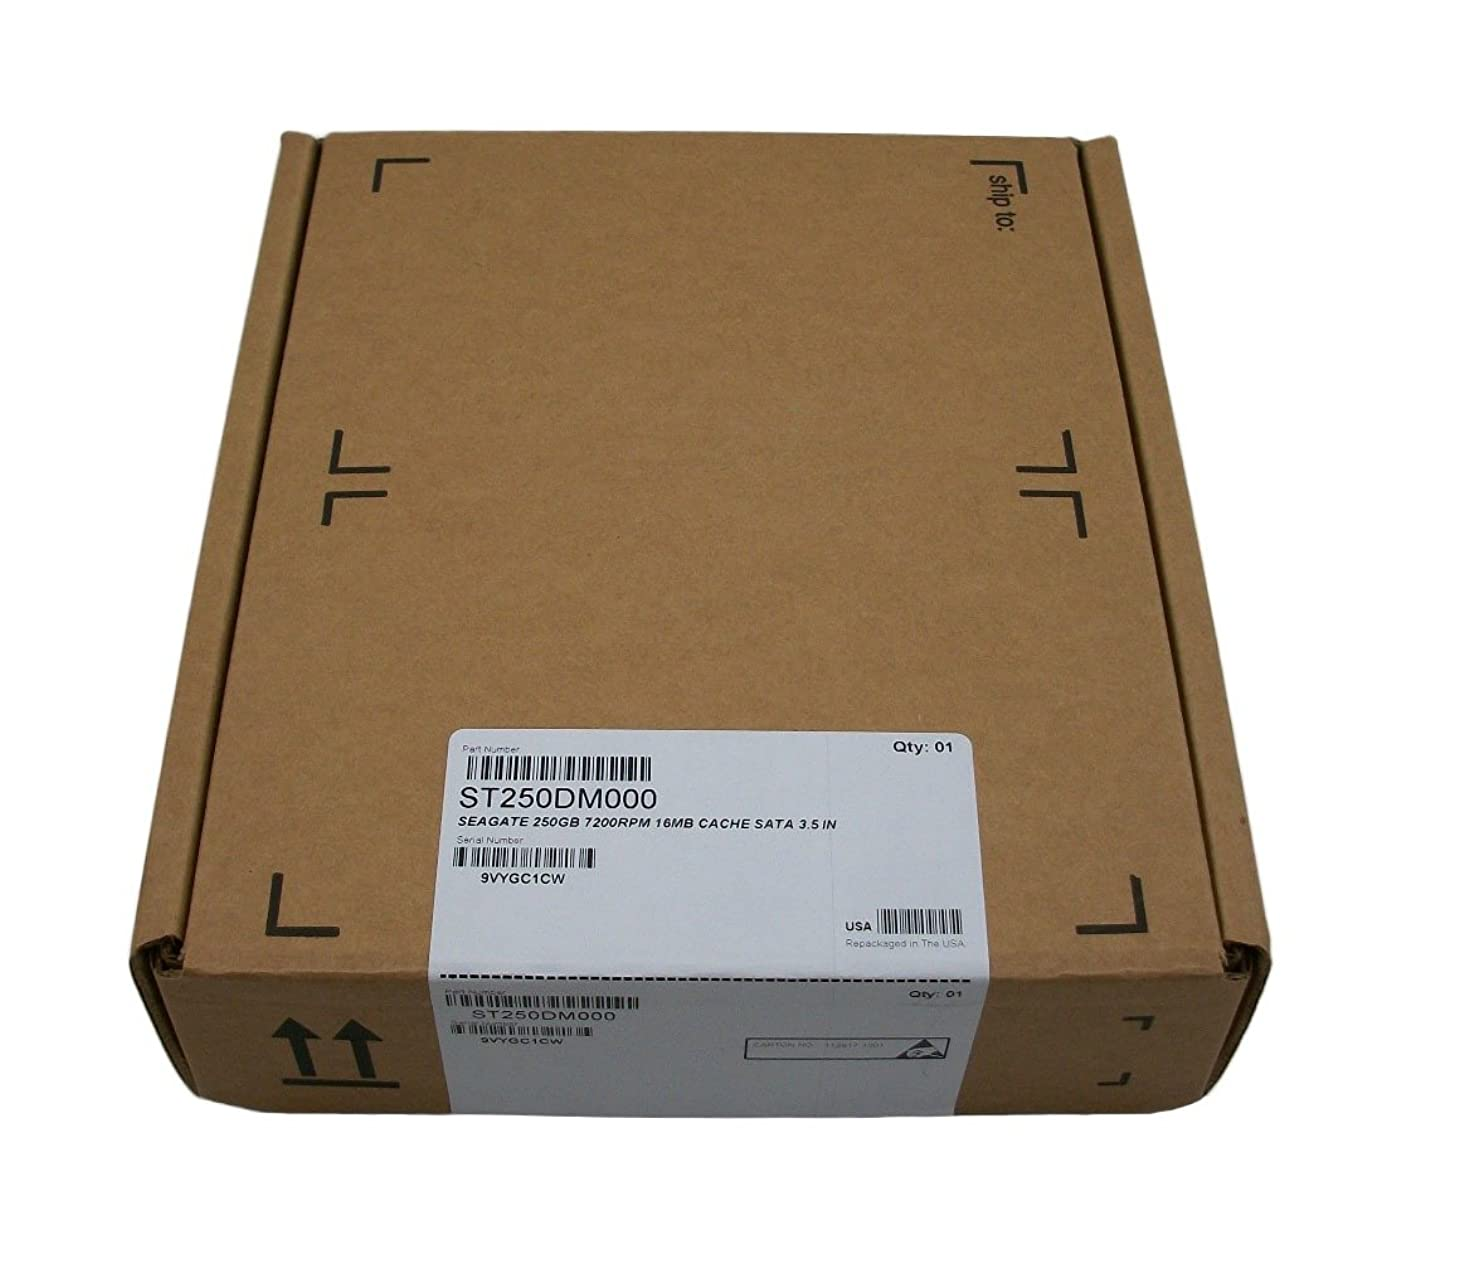 Seagate Barracuda ST250DM000 250GB 7200RPM SATA3/SATA 6.0 GB/s 16MB Hard Drive (3.5 inch)